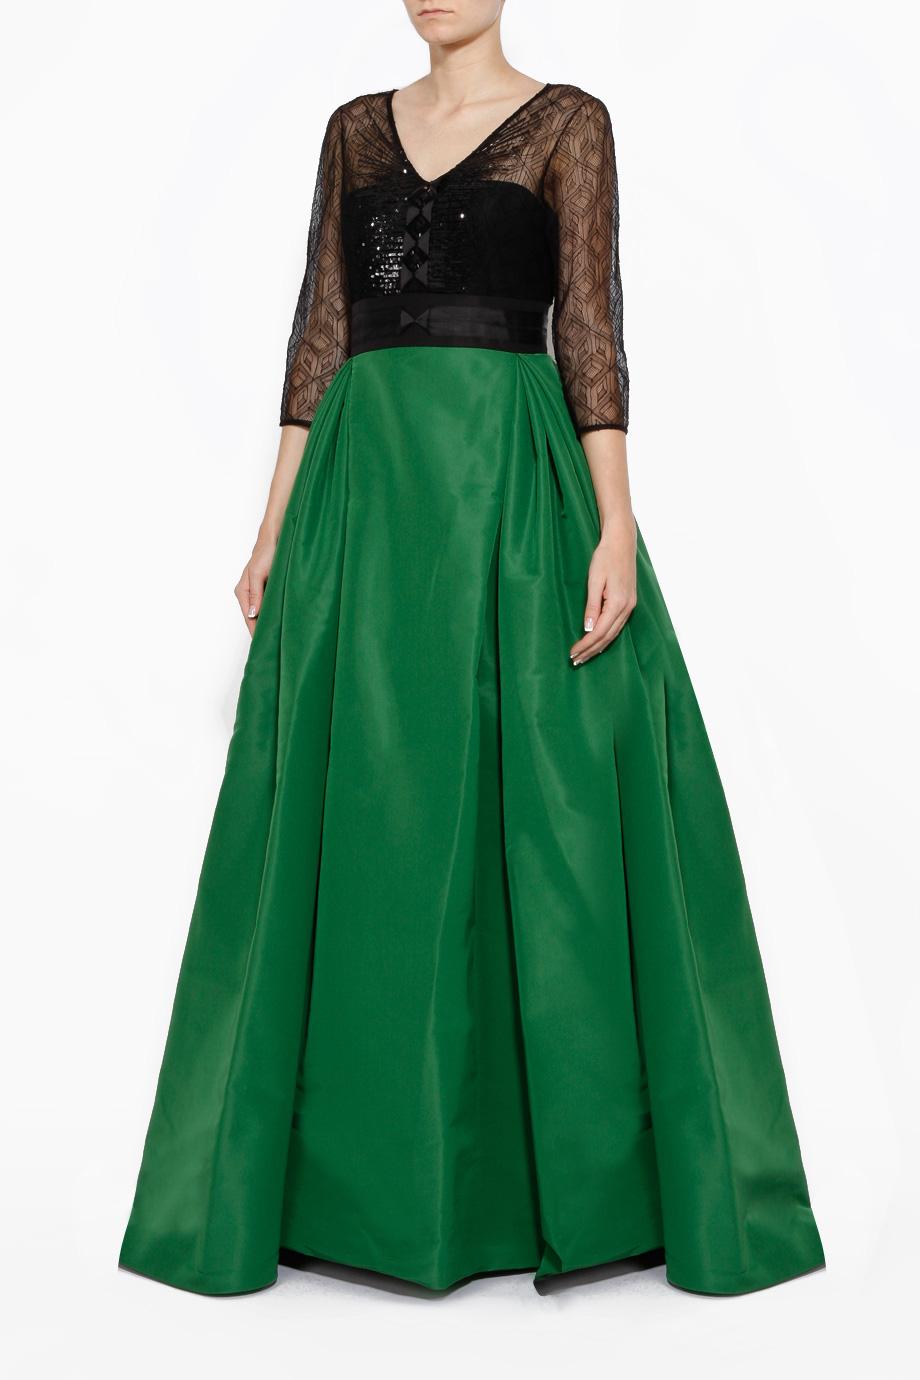 Lyst Carolina Herrera 34 Contrast Ball Gown In Green